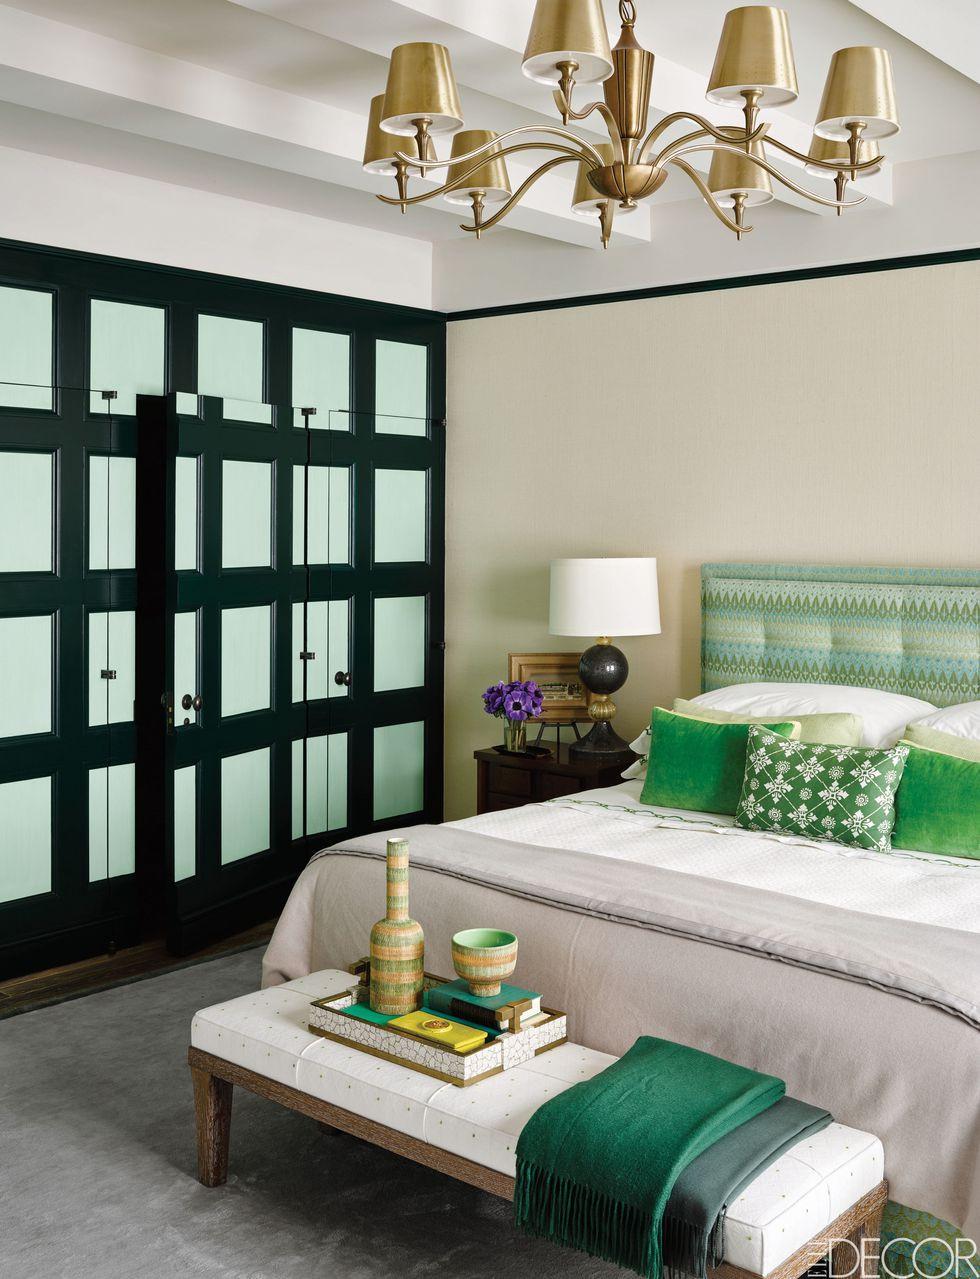 Green throw pillows and a custom green designer headboard